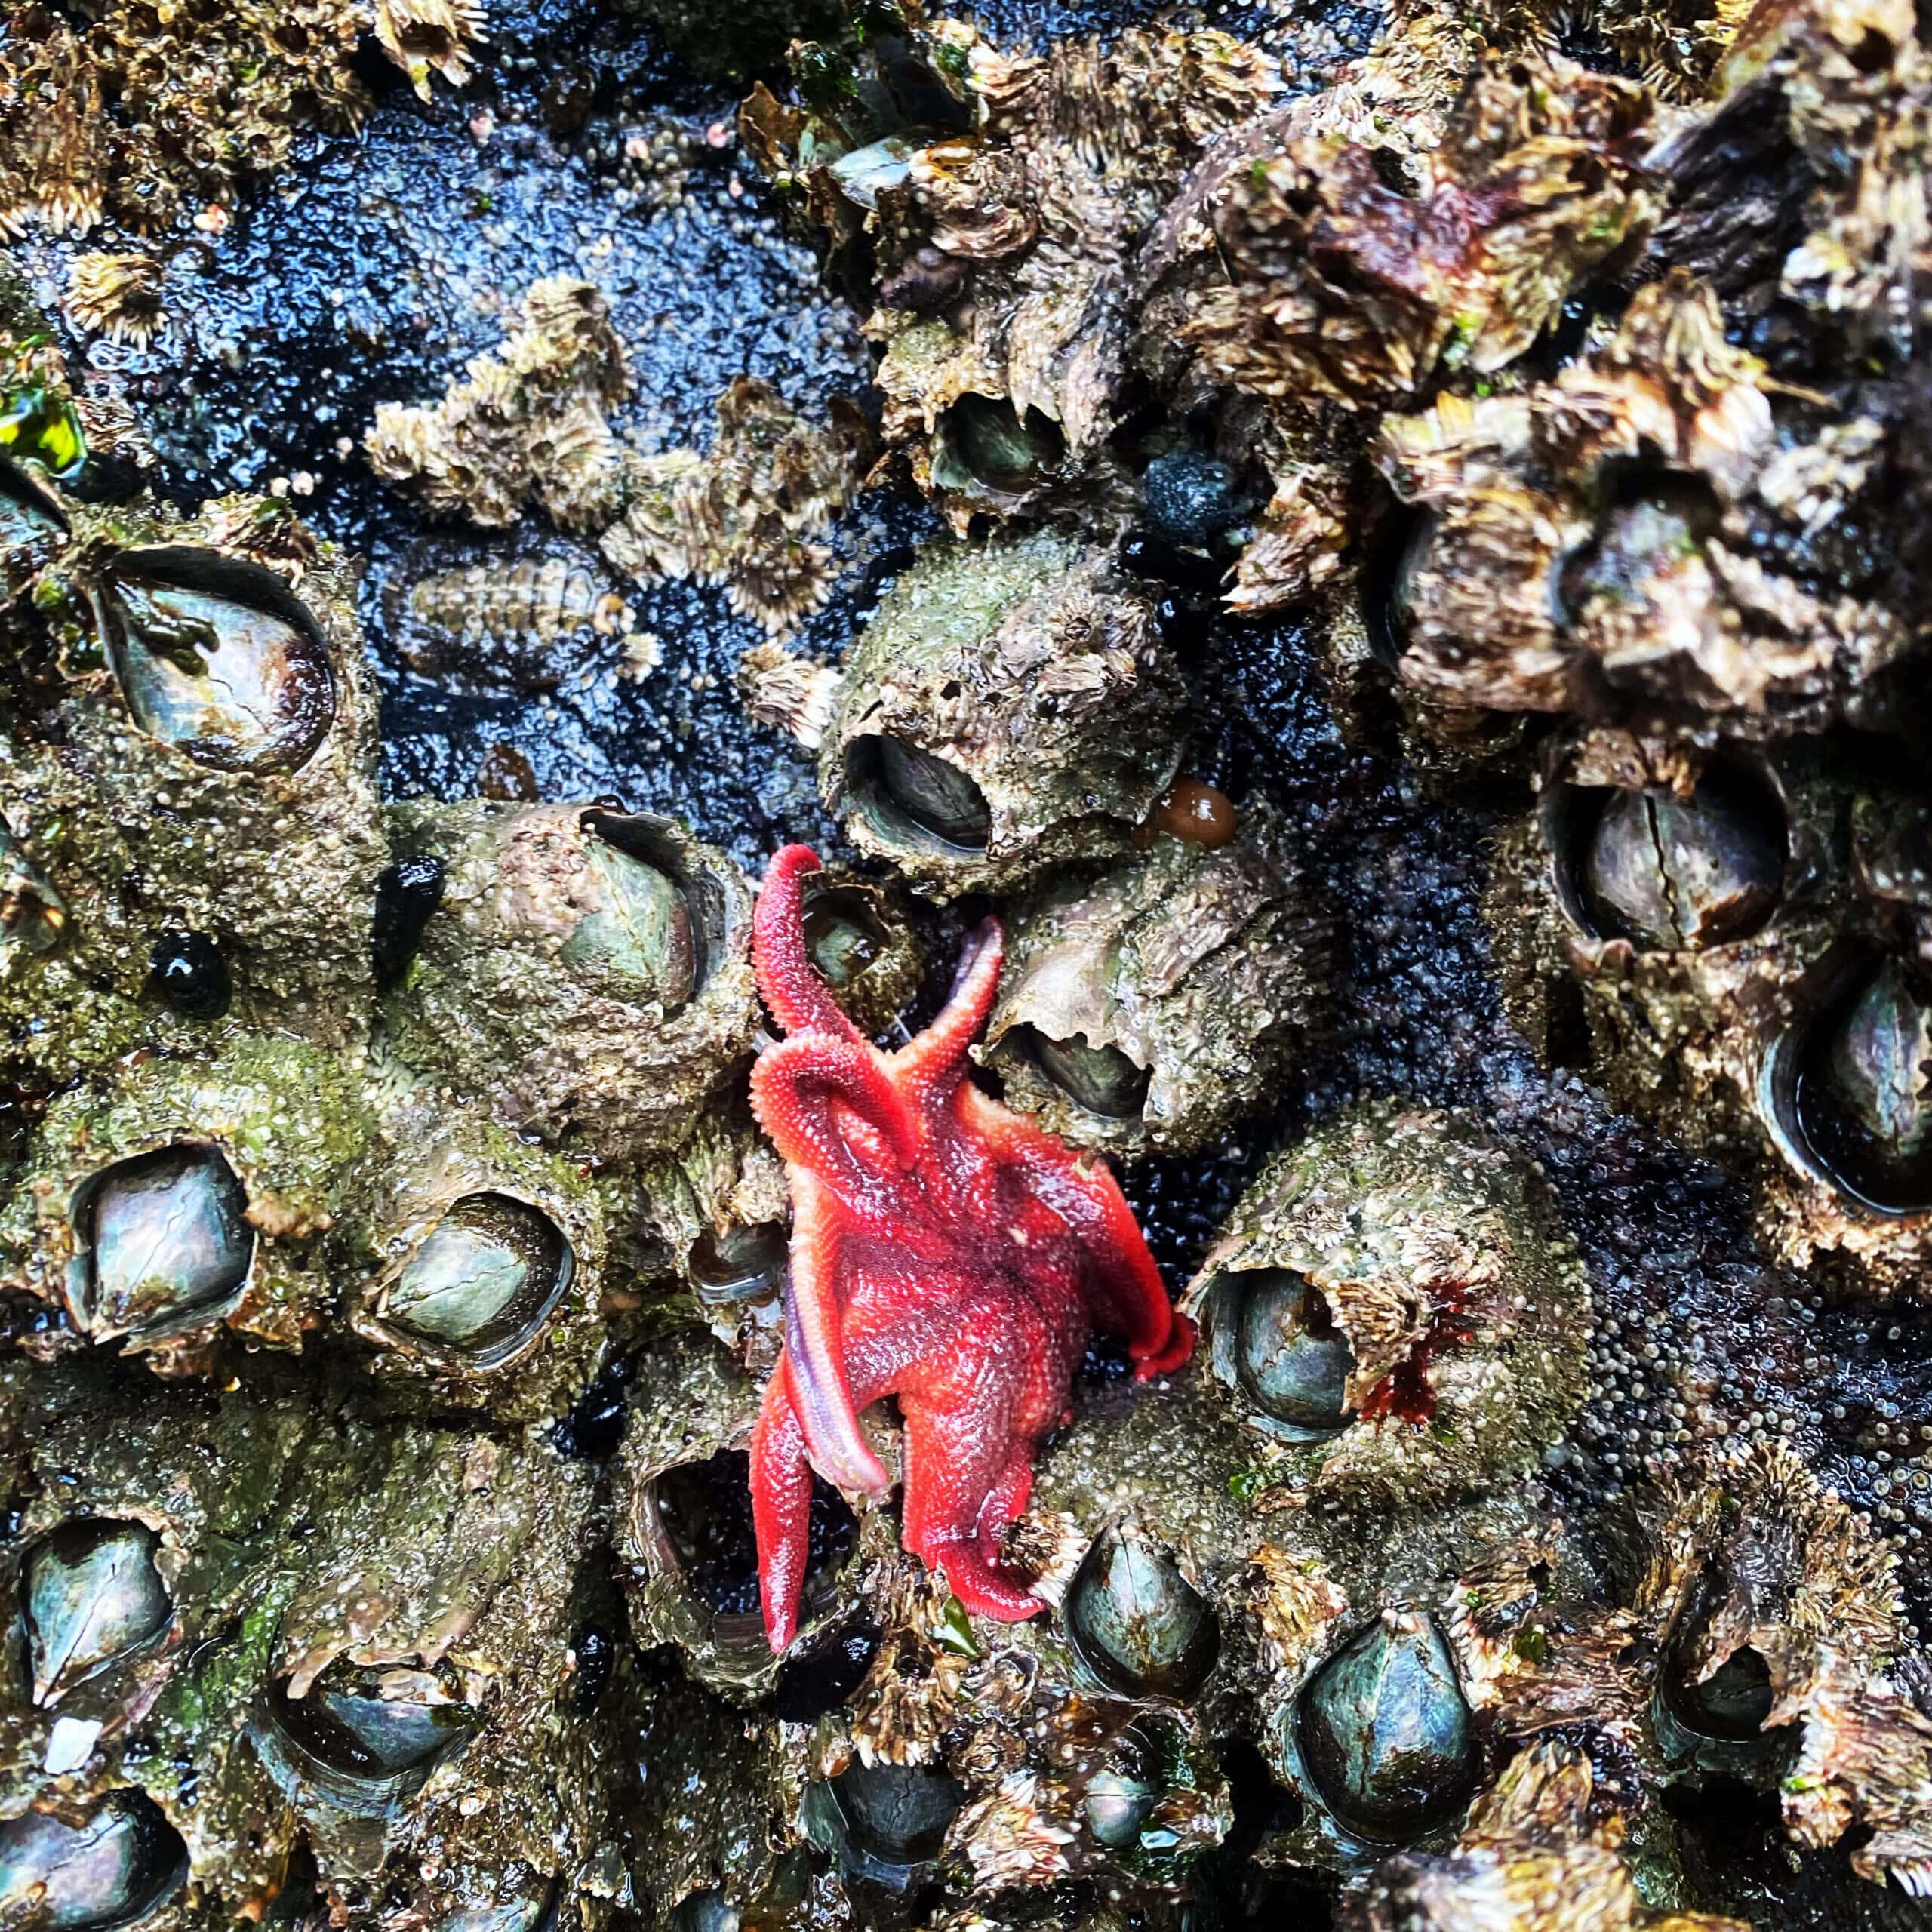 intertidal marine life, Johnstone Strait